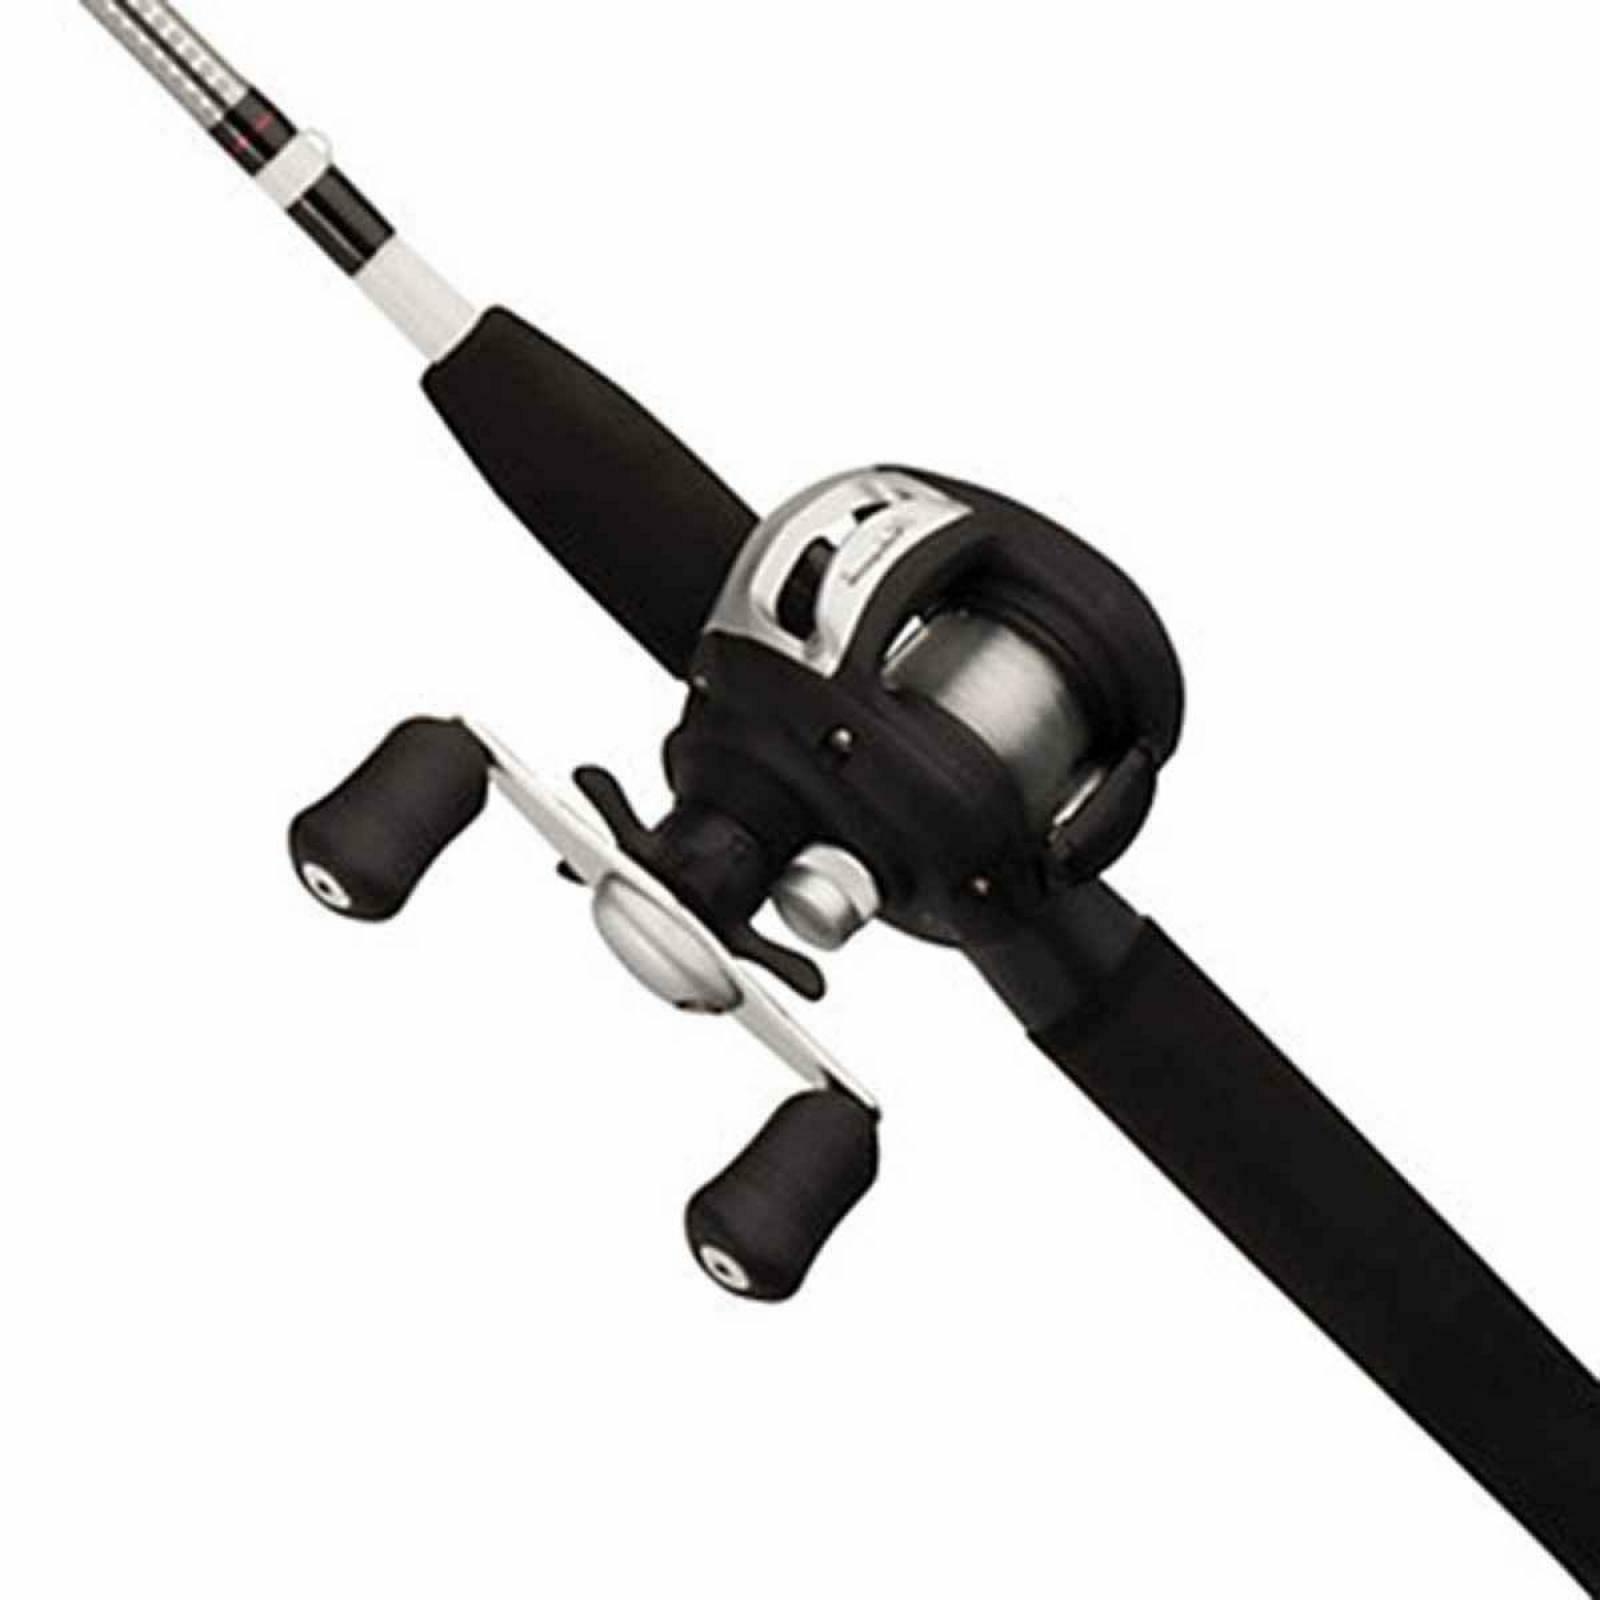 alpha medium 6 low profile fishing rod